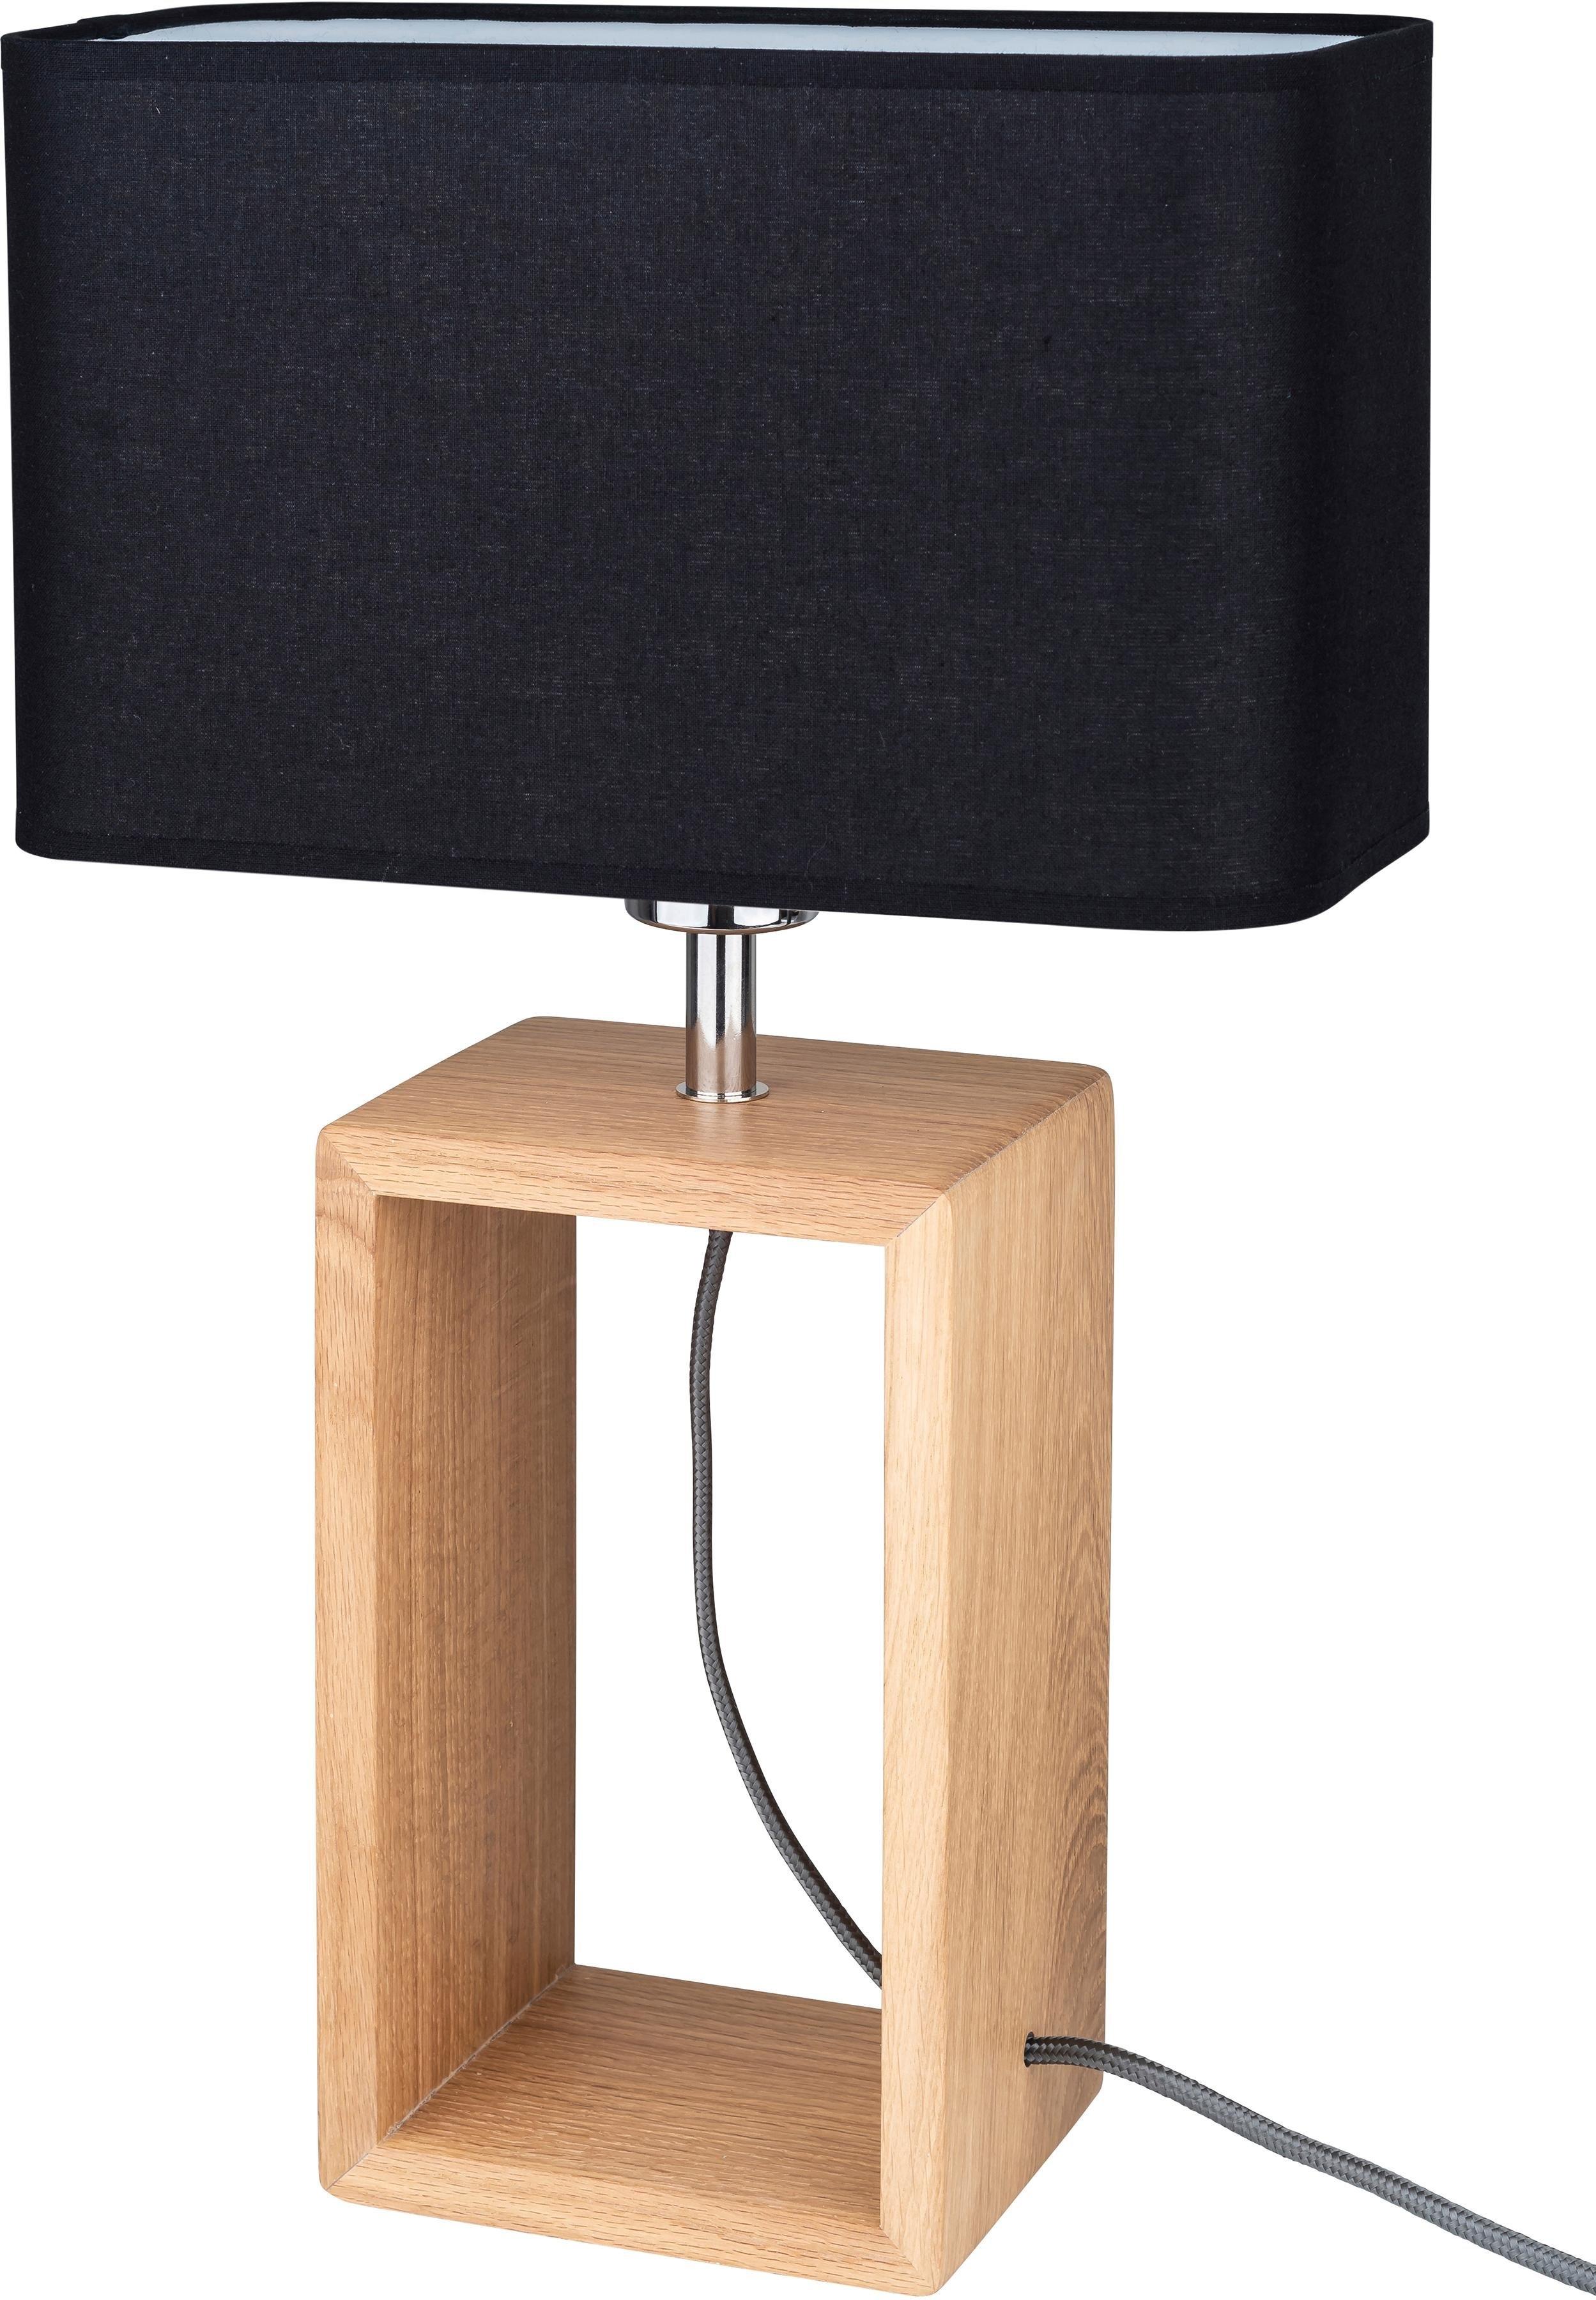 Britop Lighting tafellamp »Cadre Tischleuchte 1xE27 max.25W«, - gratis ruilen op otto.nl